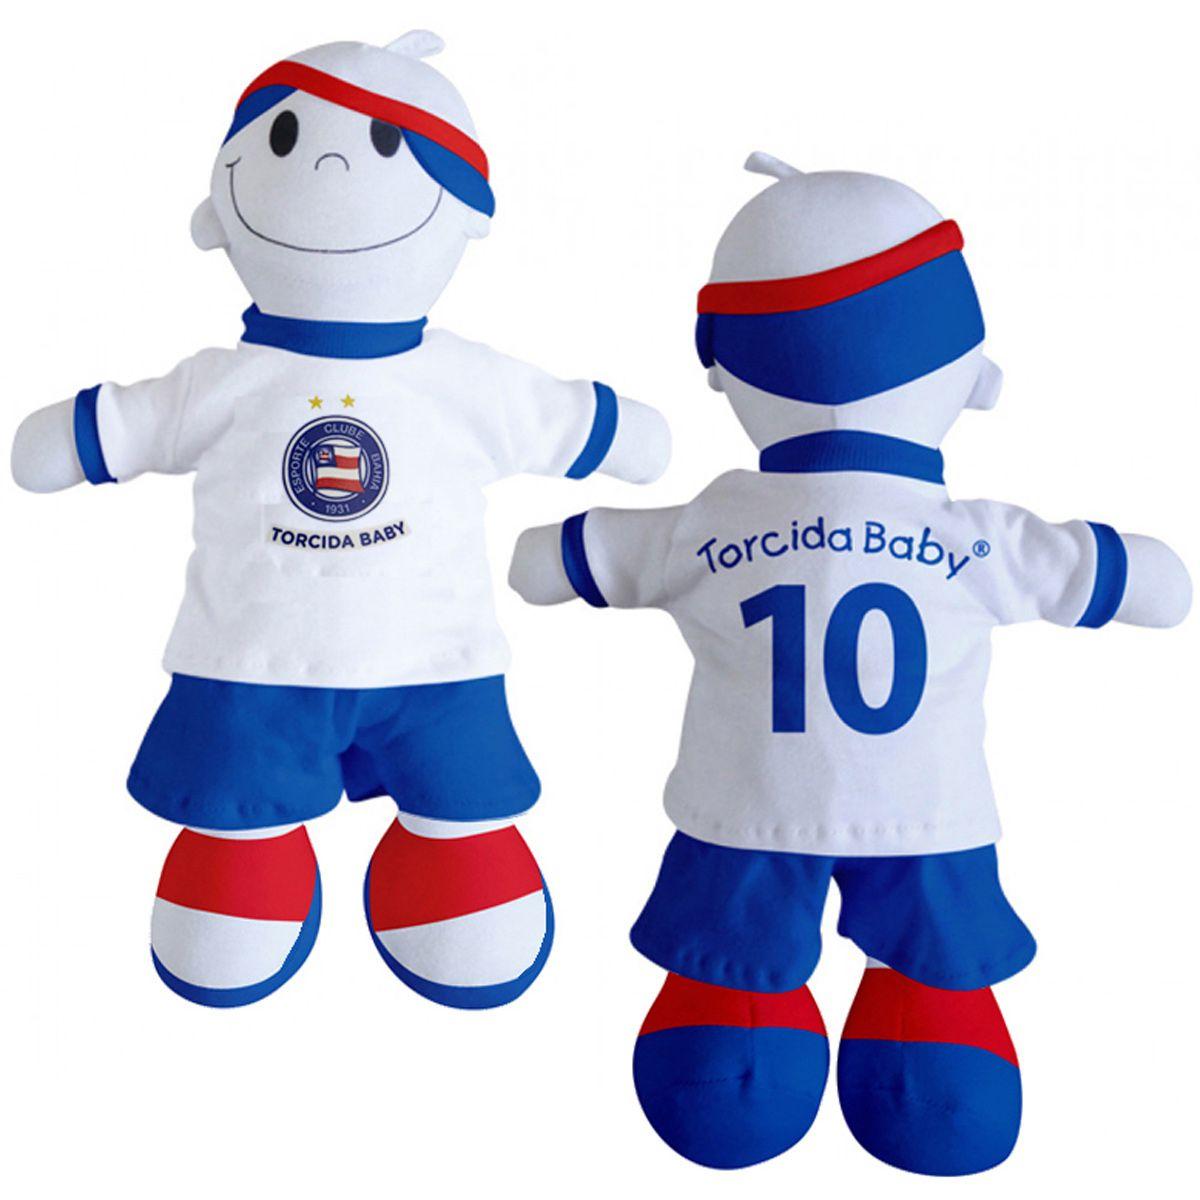 Boneco Mascote do Bahia  - Torcida Baby 238A